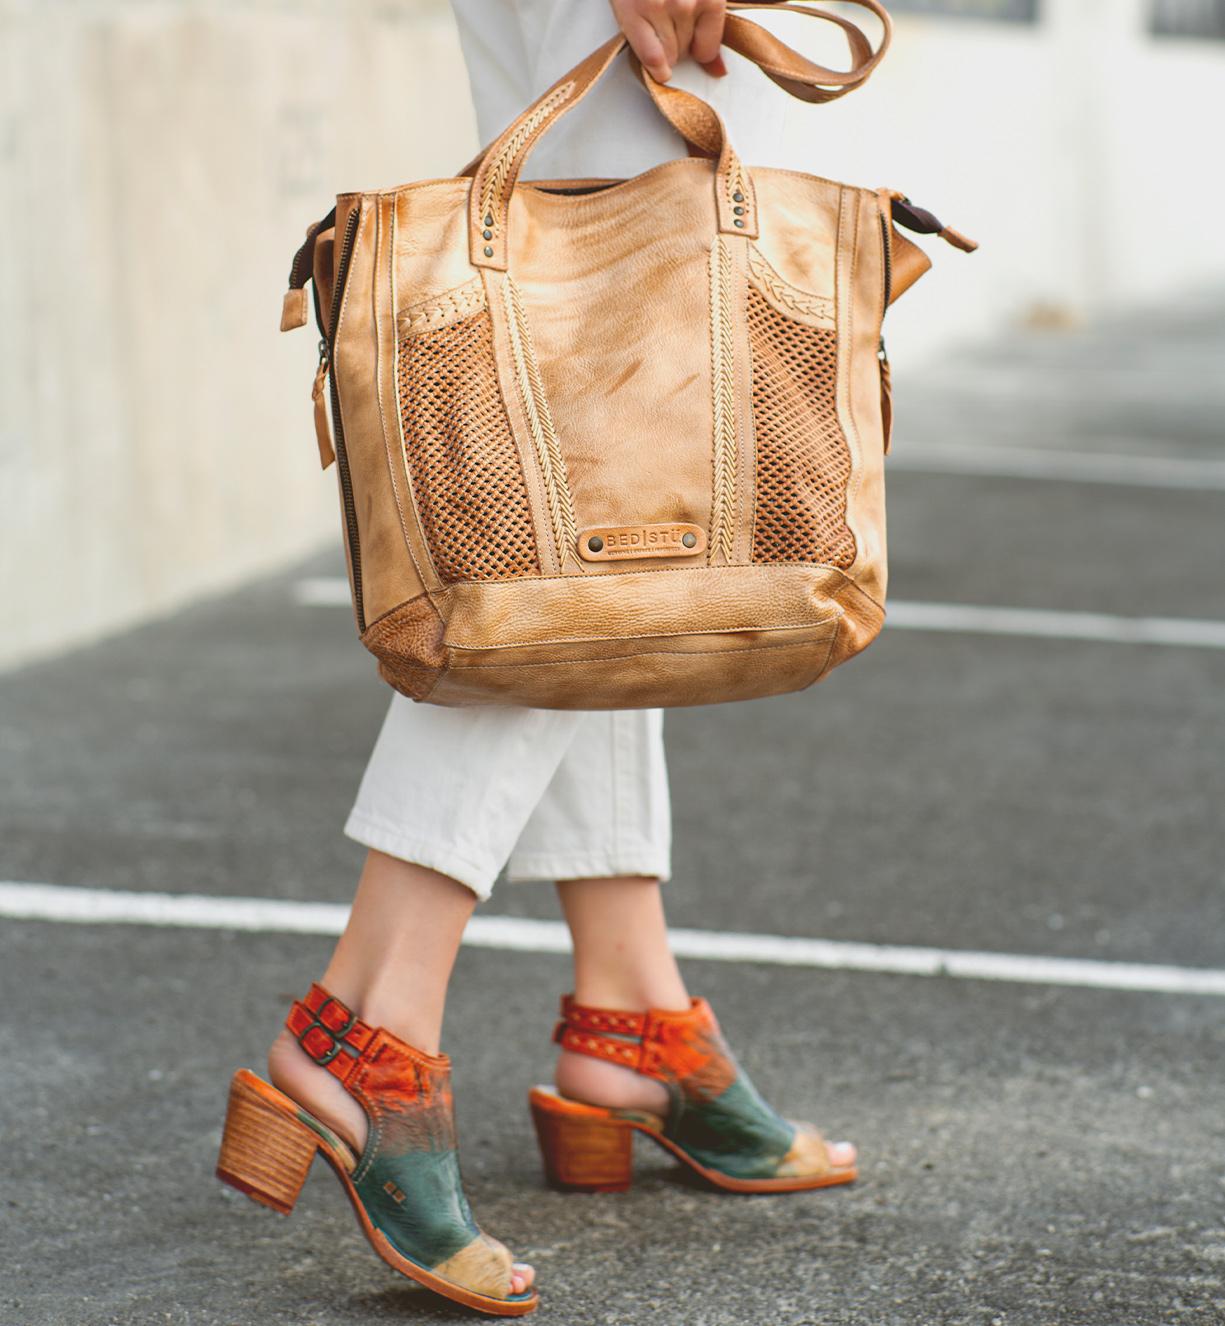 Woman's arm holding a handbag